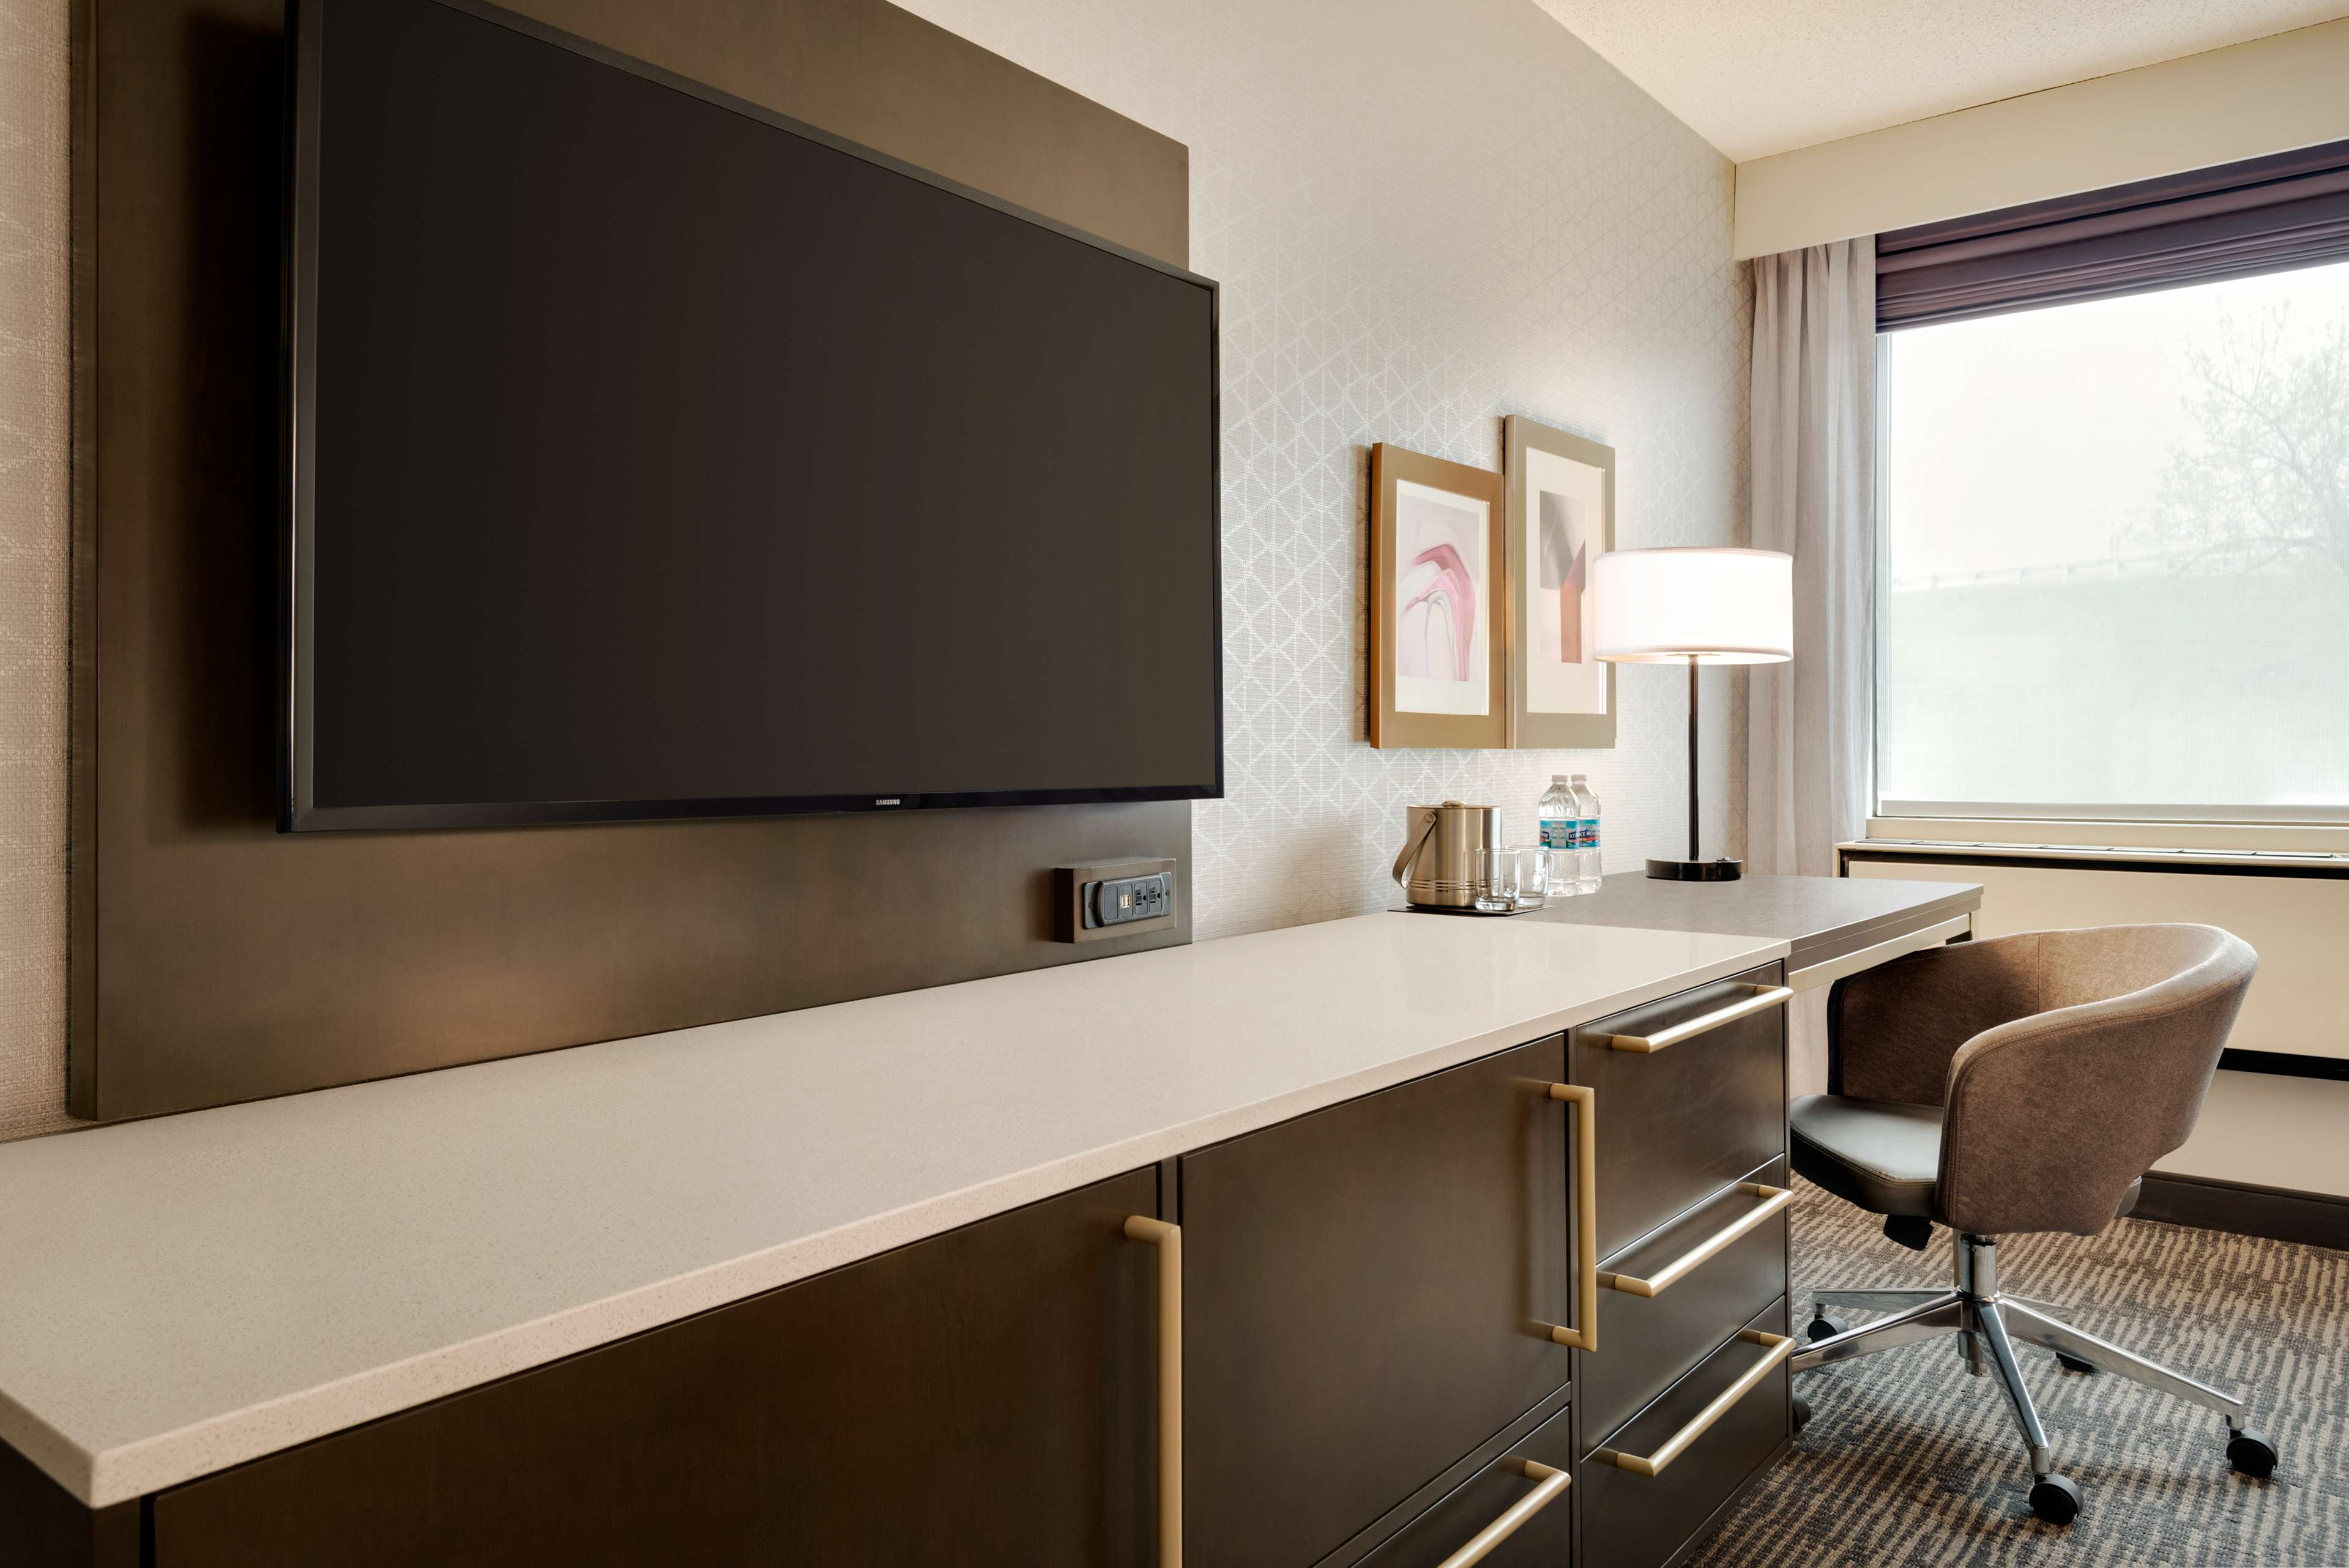 DoubleTree by Hilton St. Paul East image 11